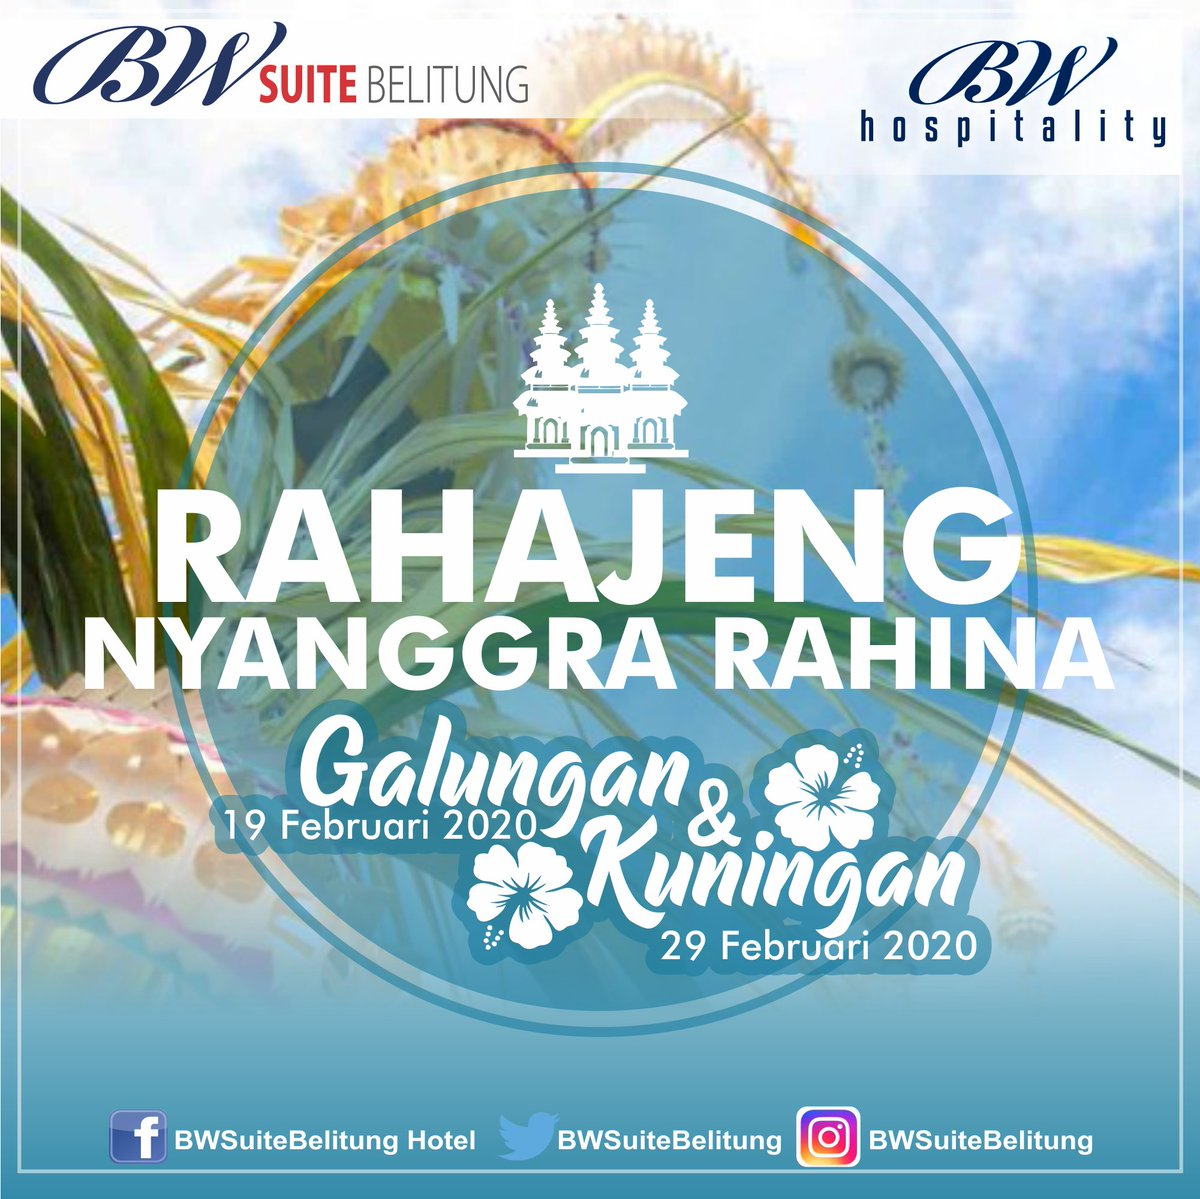 Rahajeng Nyanggra Rahina Galungan lan Kuningan umat sedharma #galungan #kuningan #seasongreetings #hindu #bhinekatunggalika #indonesia #balinese #bali #belitung #umatsedharma #culture #balineseculture #live #hidup #positivevibes #livegoals #happy #happiness #instalike #lovepic.twitter.com/3JnhpmSbNj